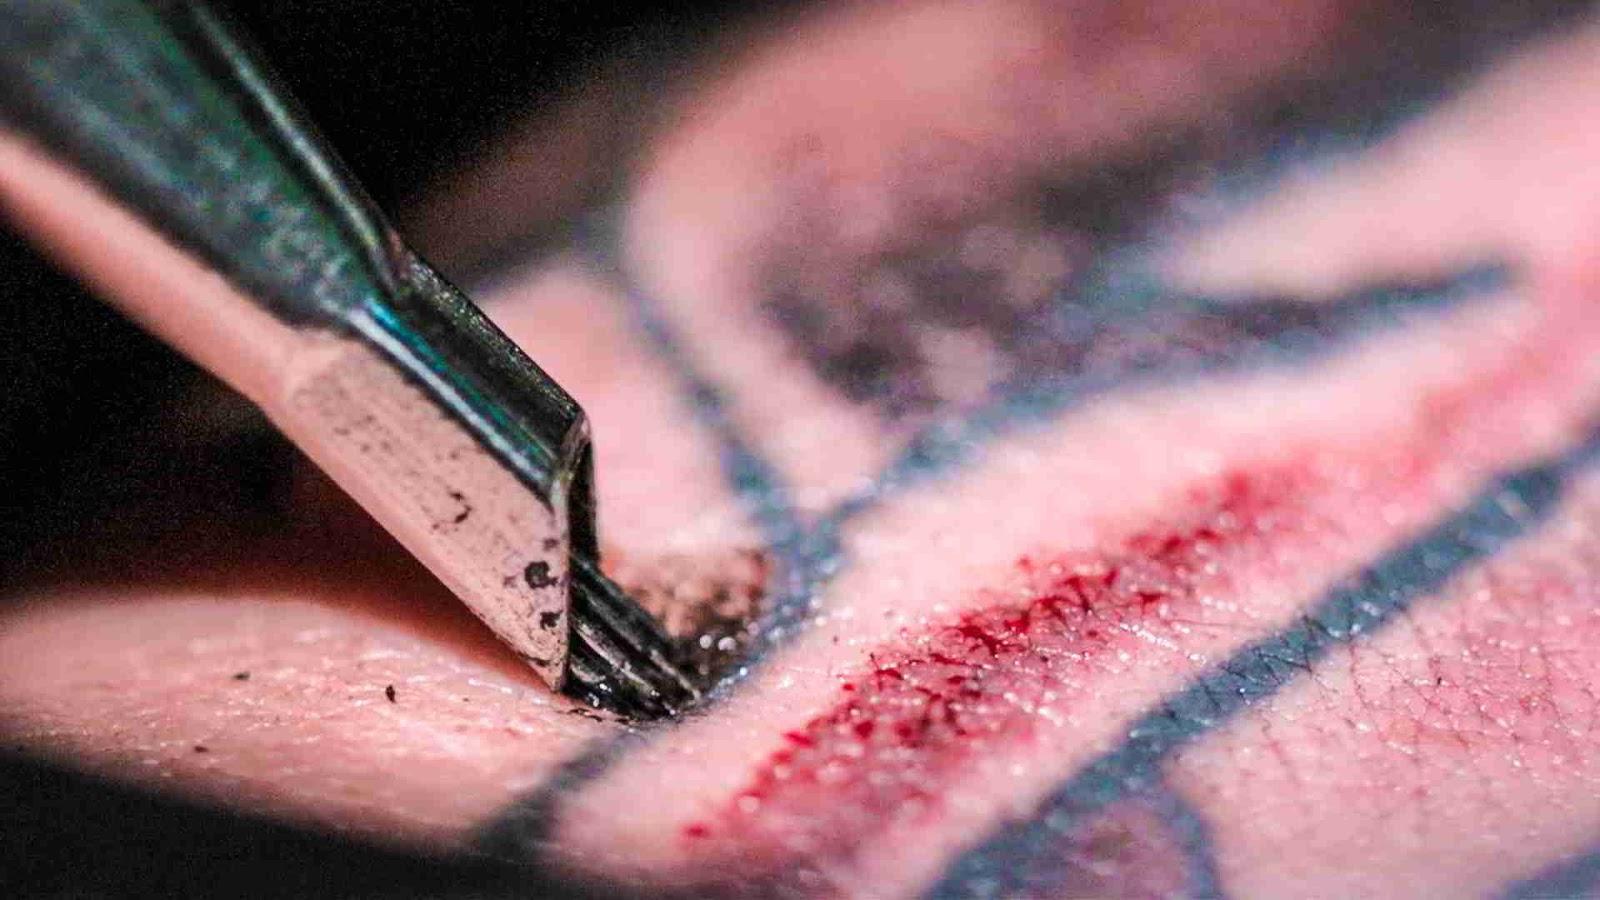 primer plano de una aguja de tatuaje penetrando en la piel